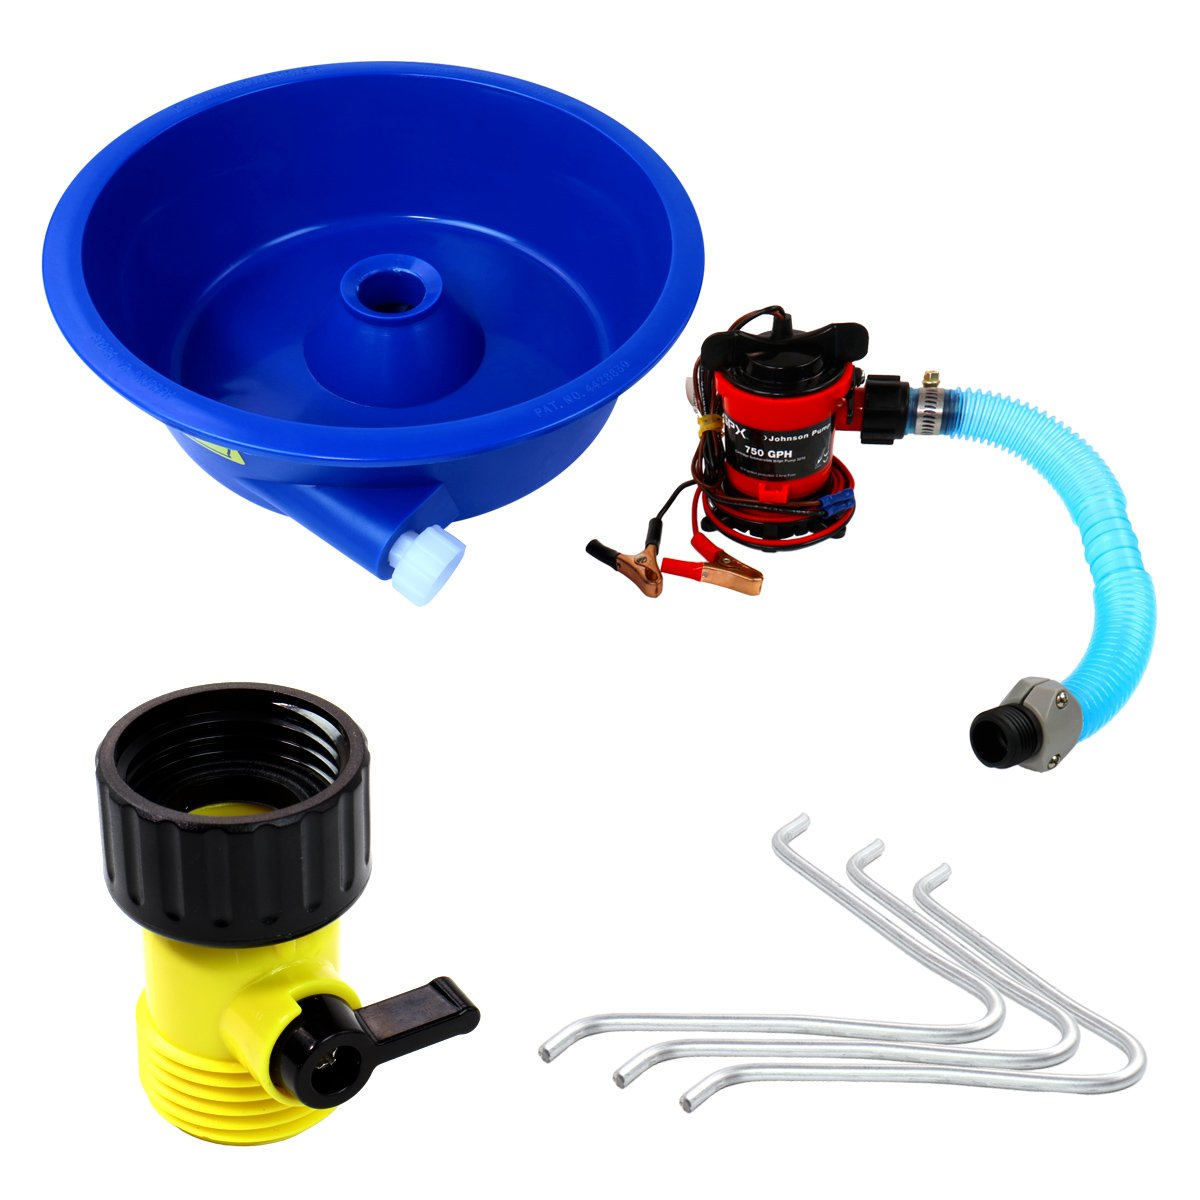 Blue Bowl Concentrator Kit w/Pump & Leg Levelers